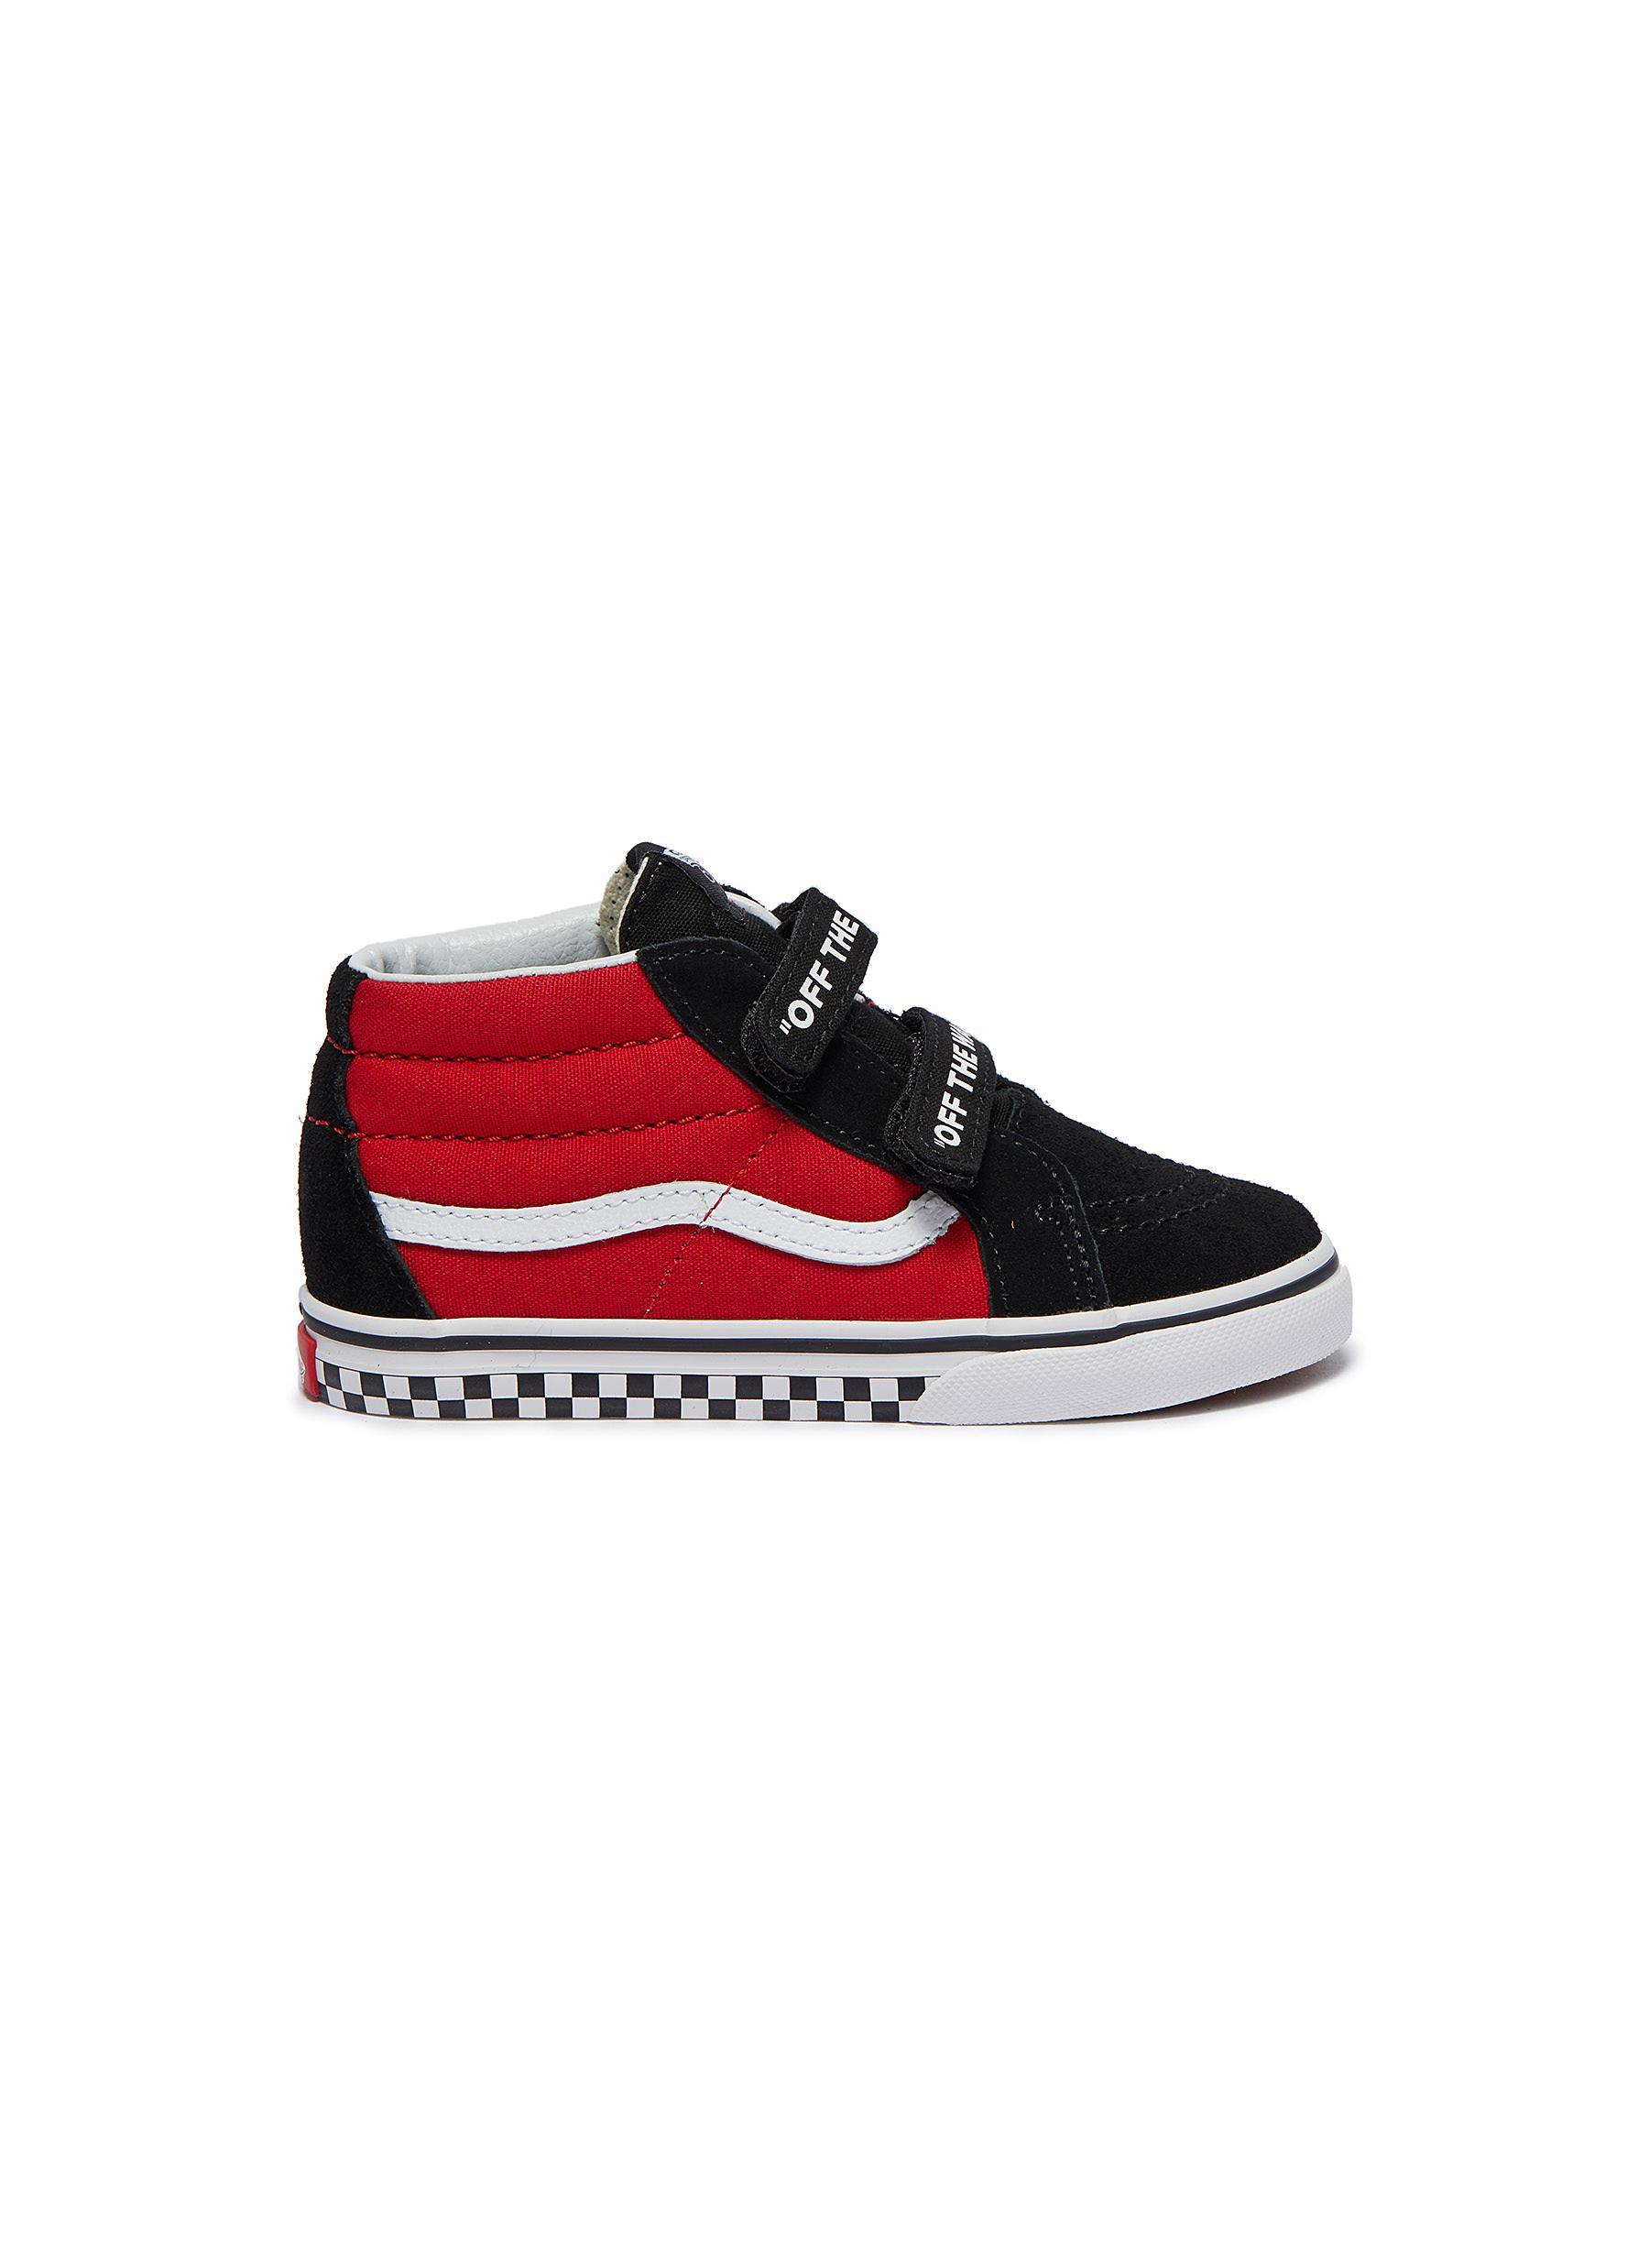 cd486067213439 Vans.  Sk8-Mid Reissue V  patchwork toddler sneakers